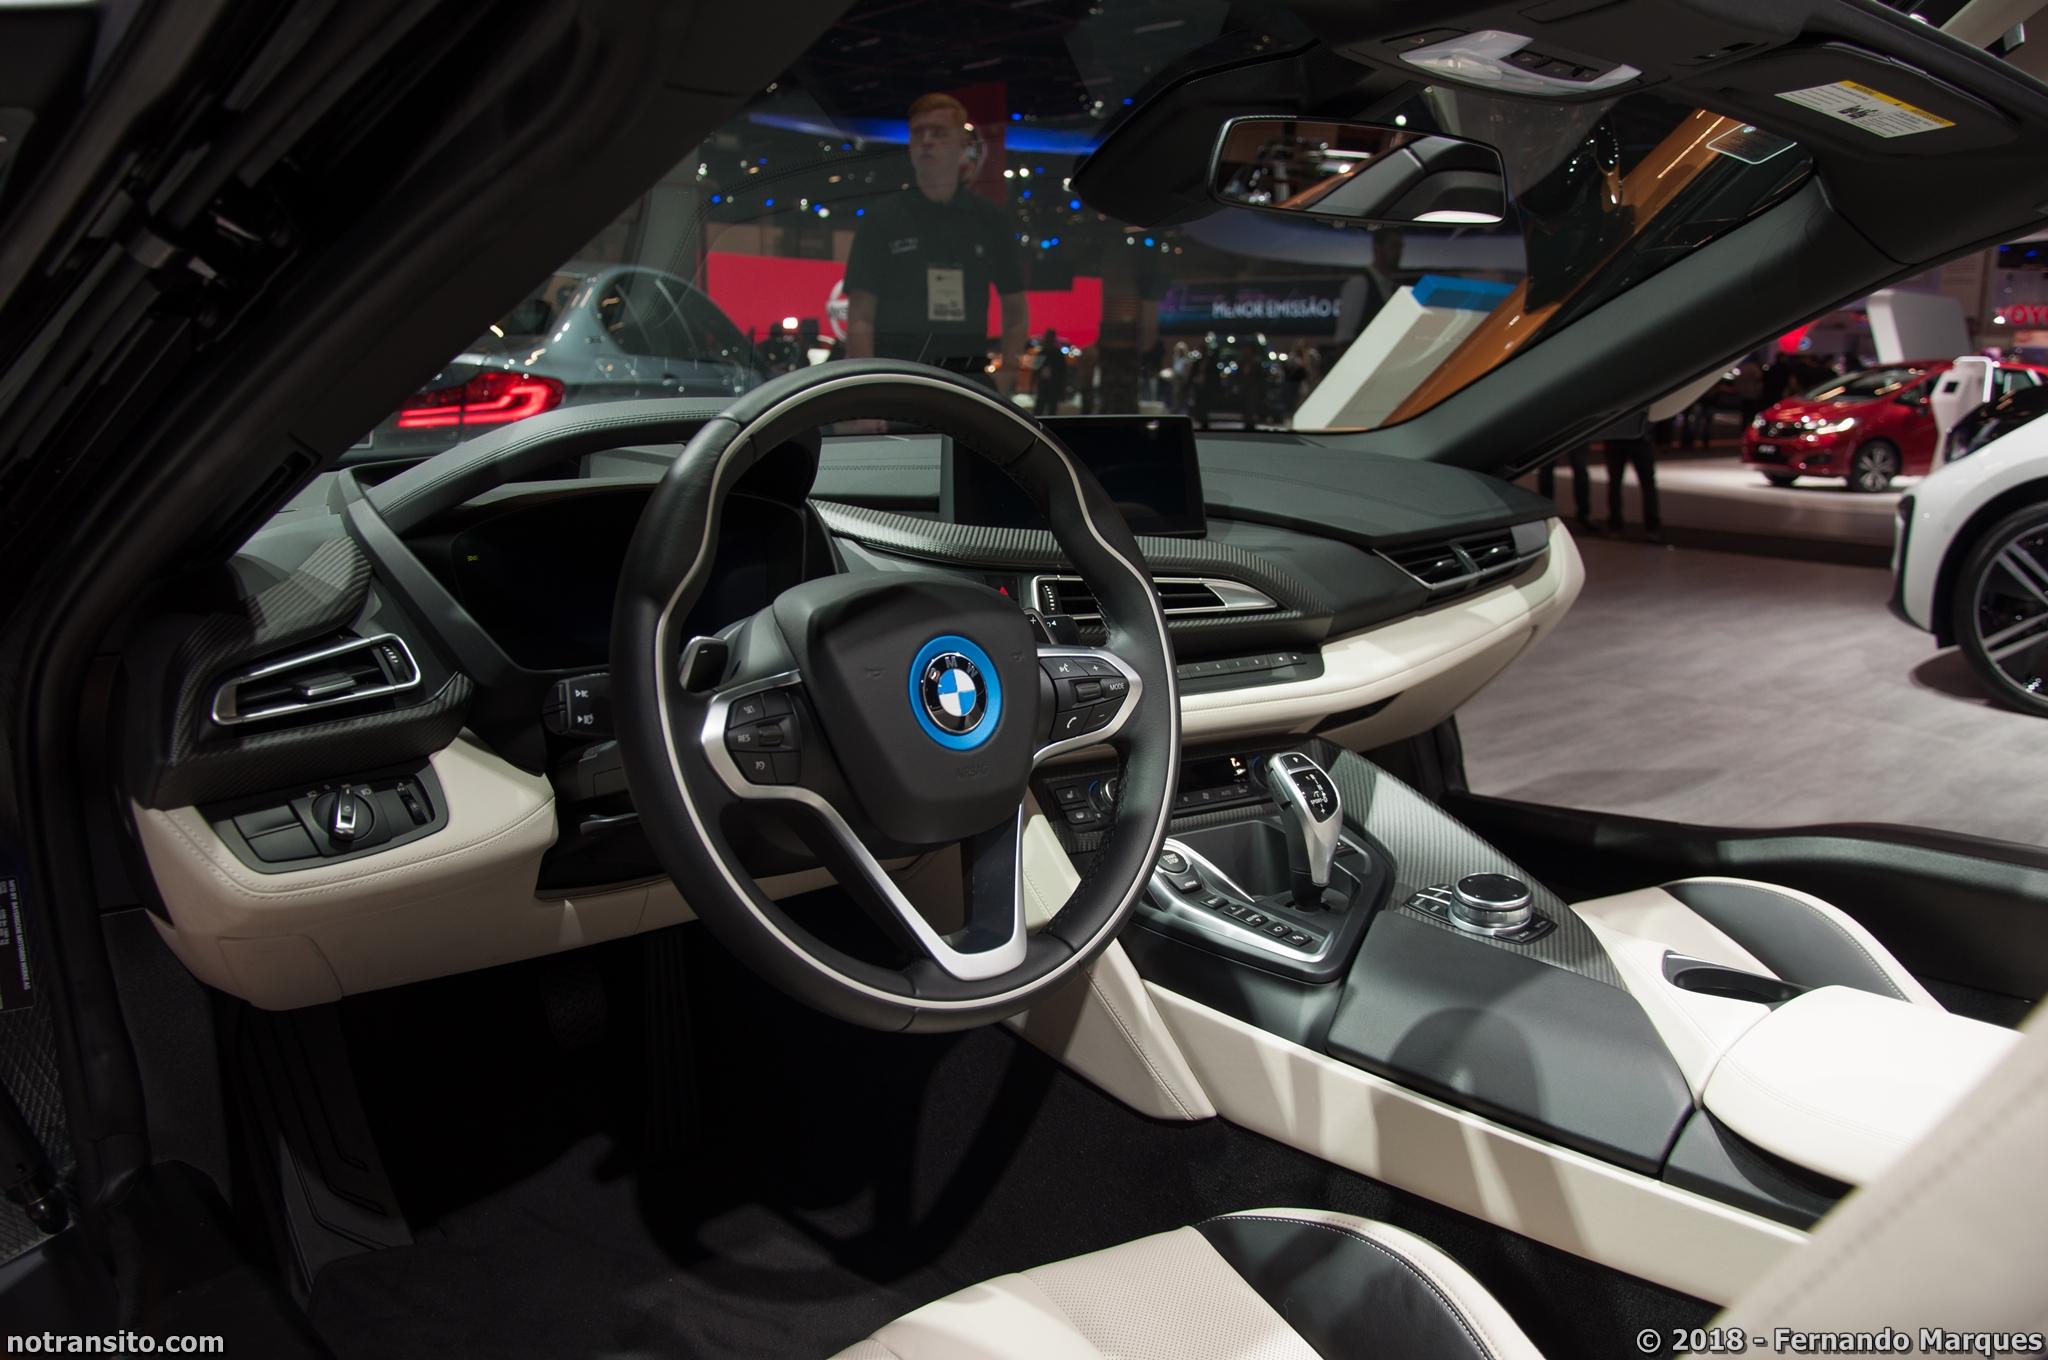 Salão2018-BMWi8Roadster--5